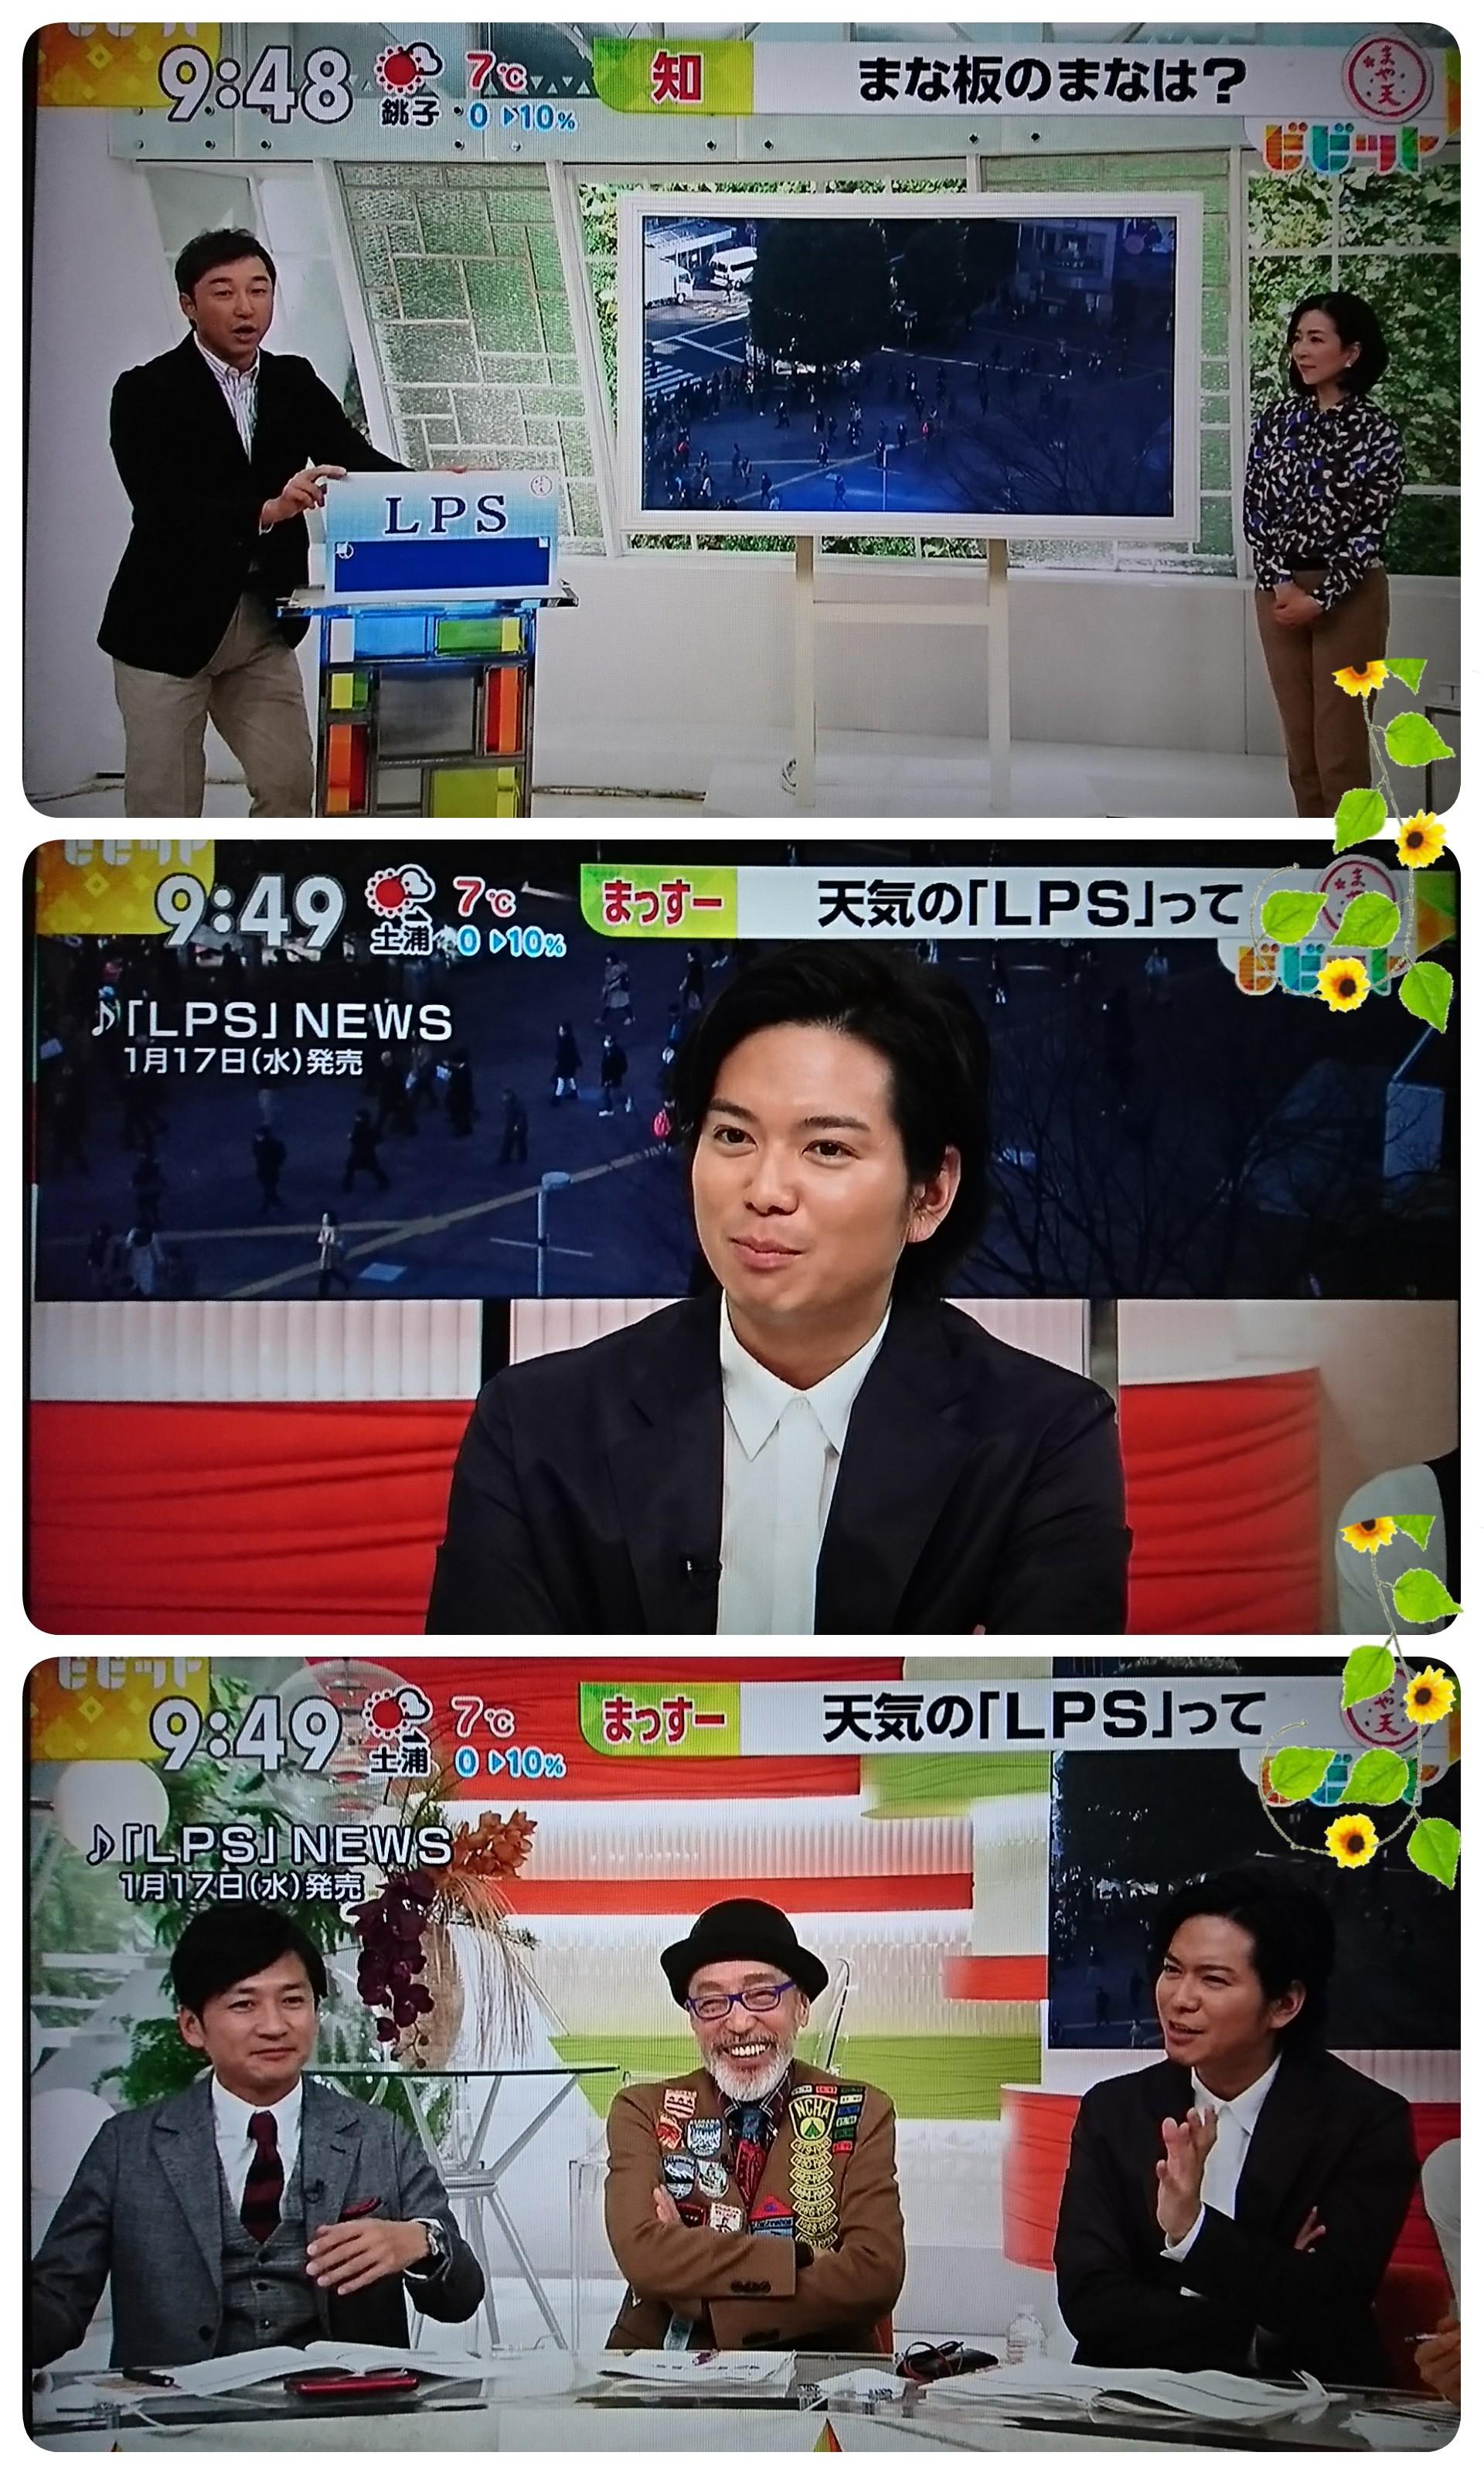 f:id:sunflower-shigeaki:20180115224930j:image